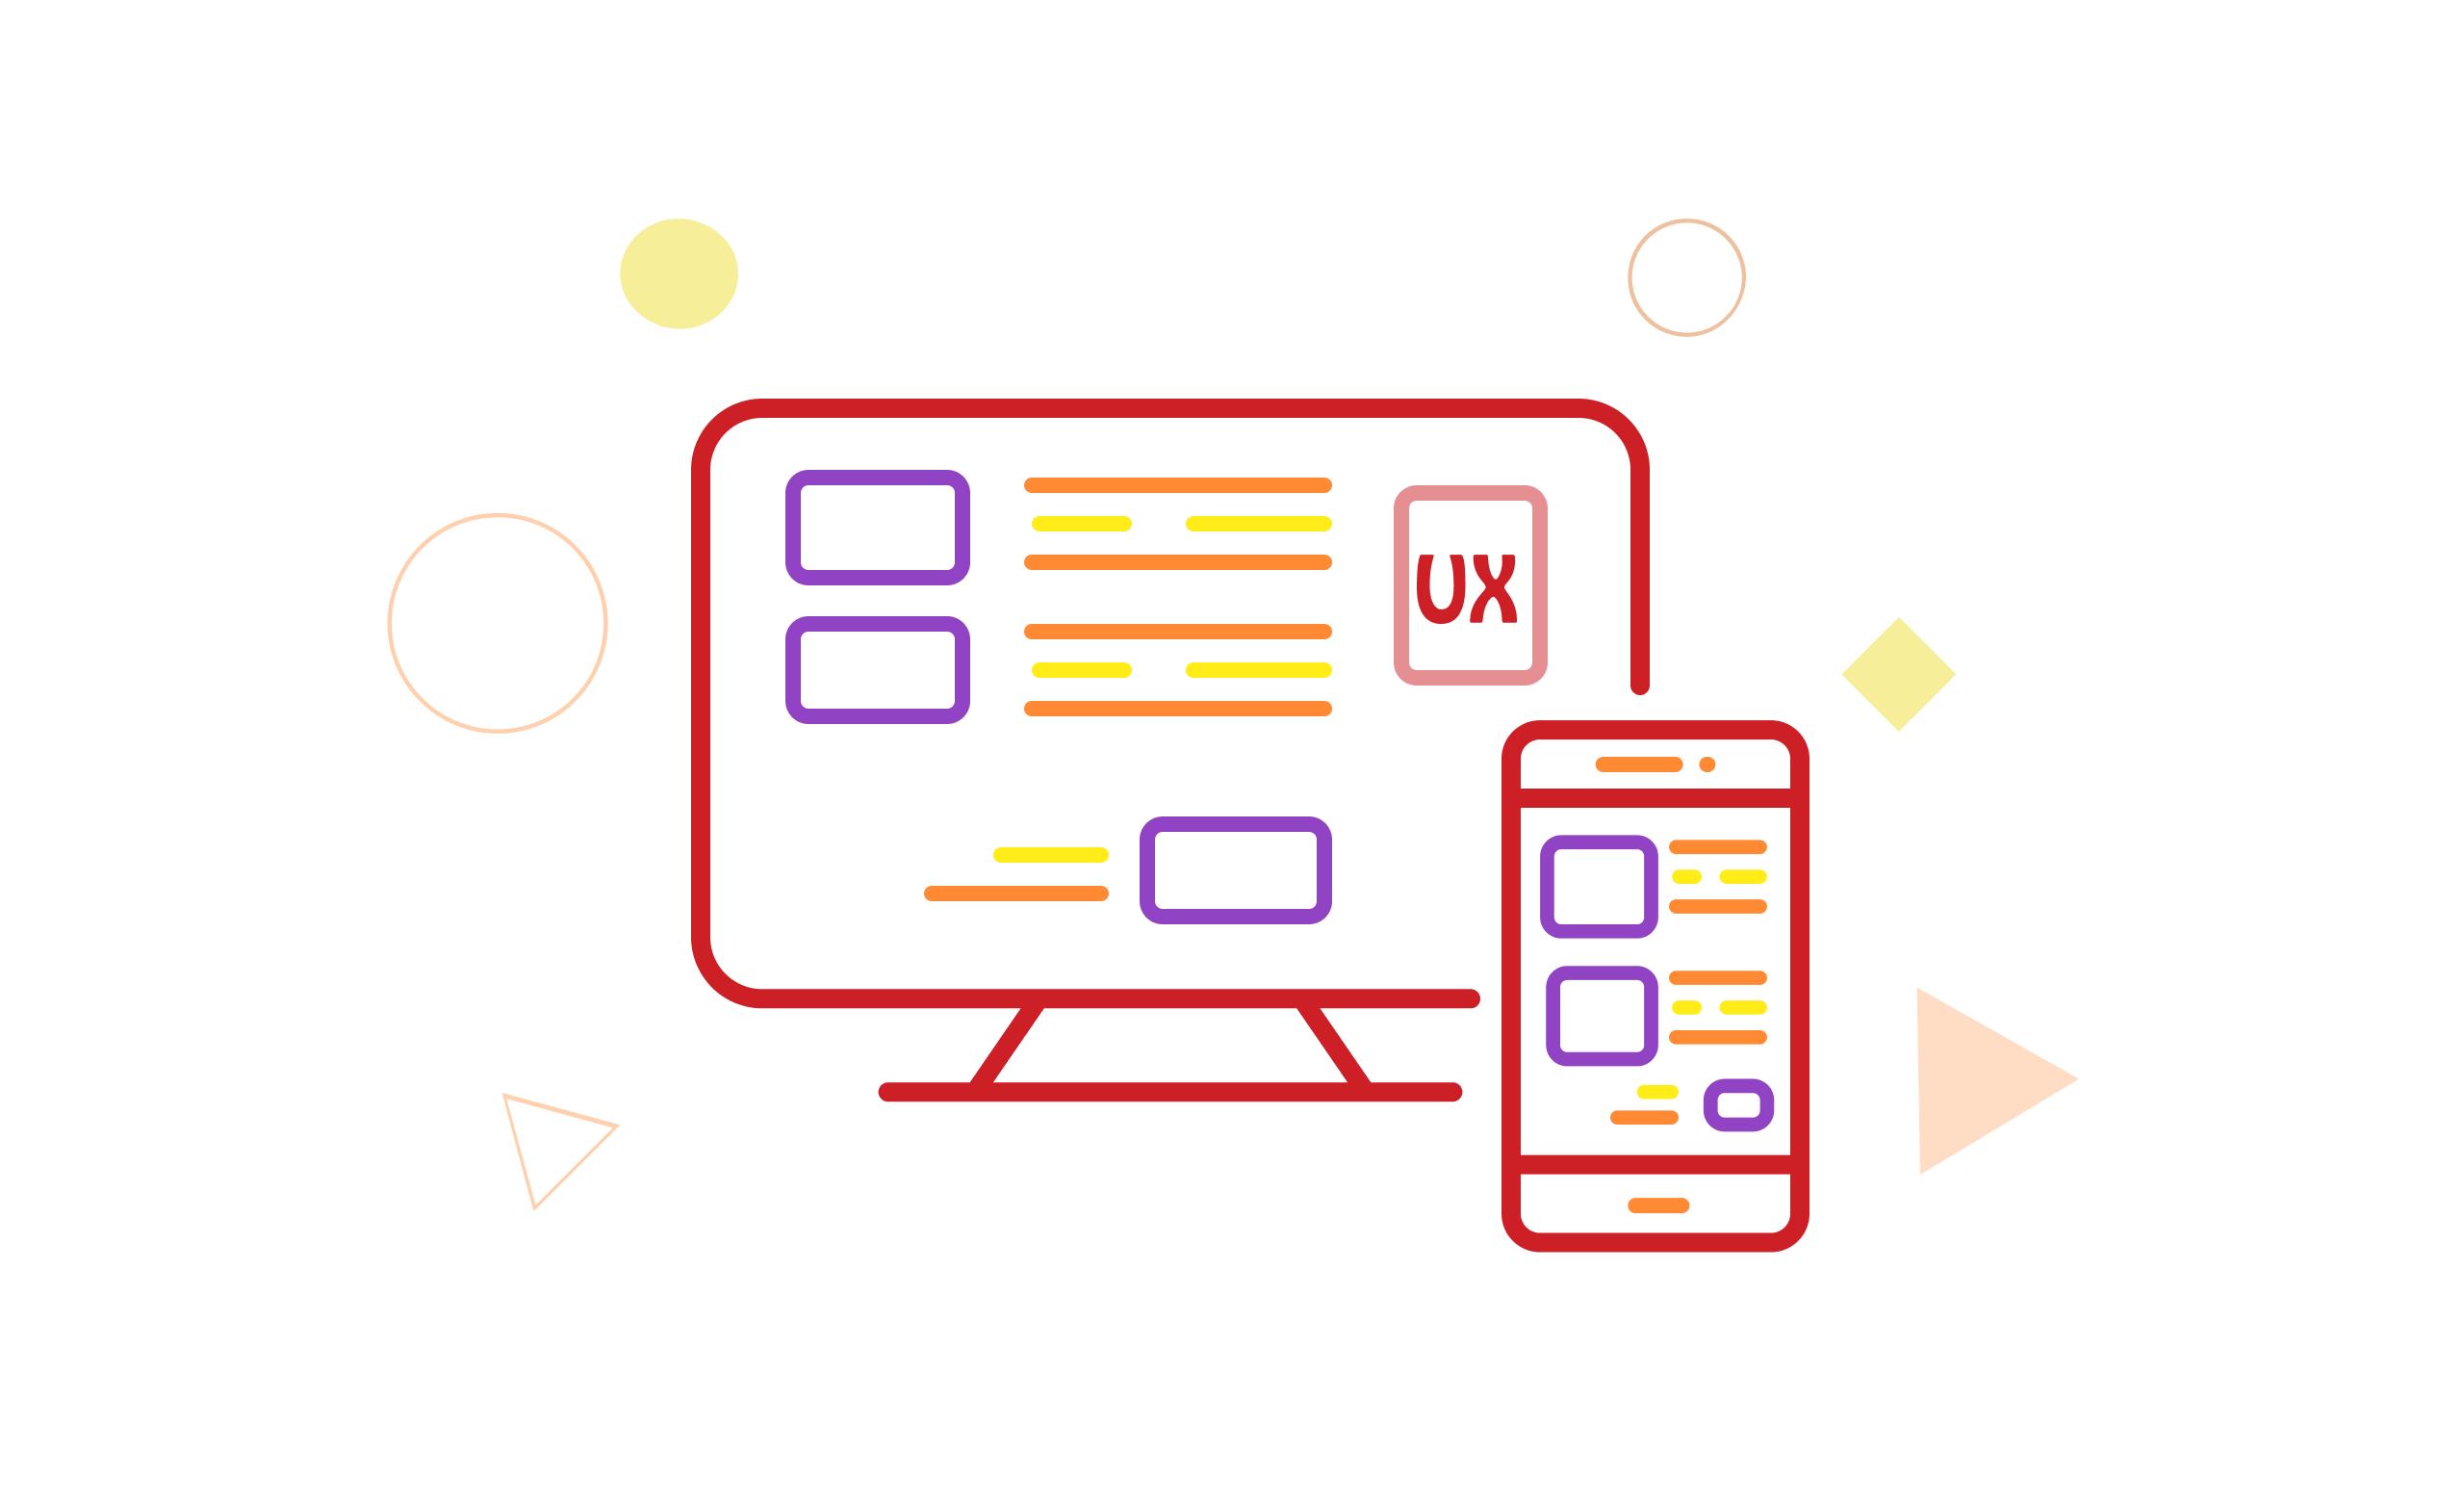 UI UX Design from Scratch (Classroom)